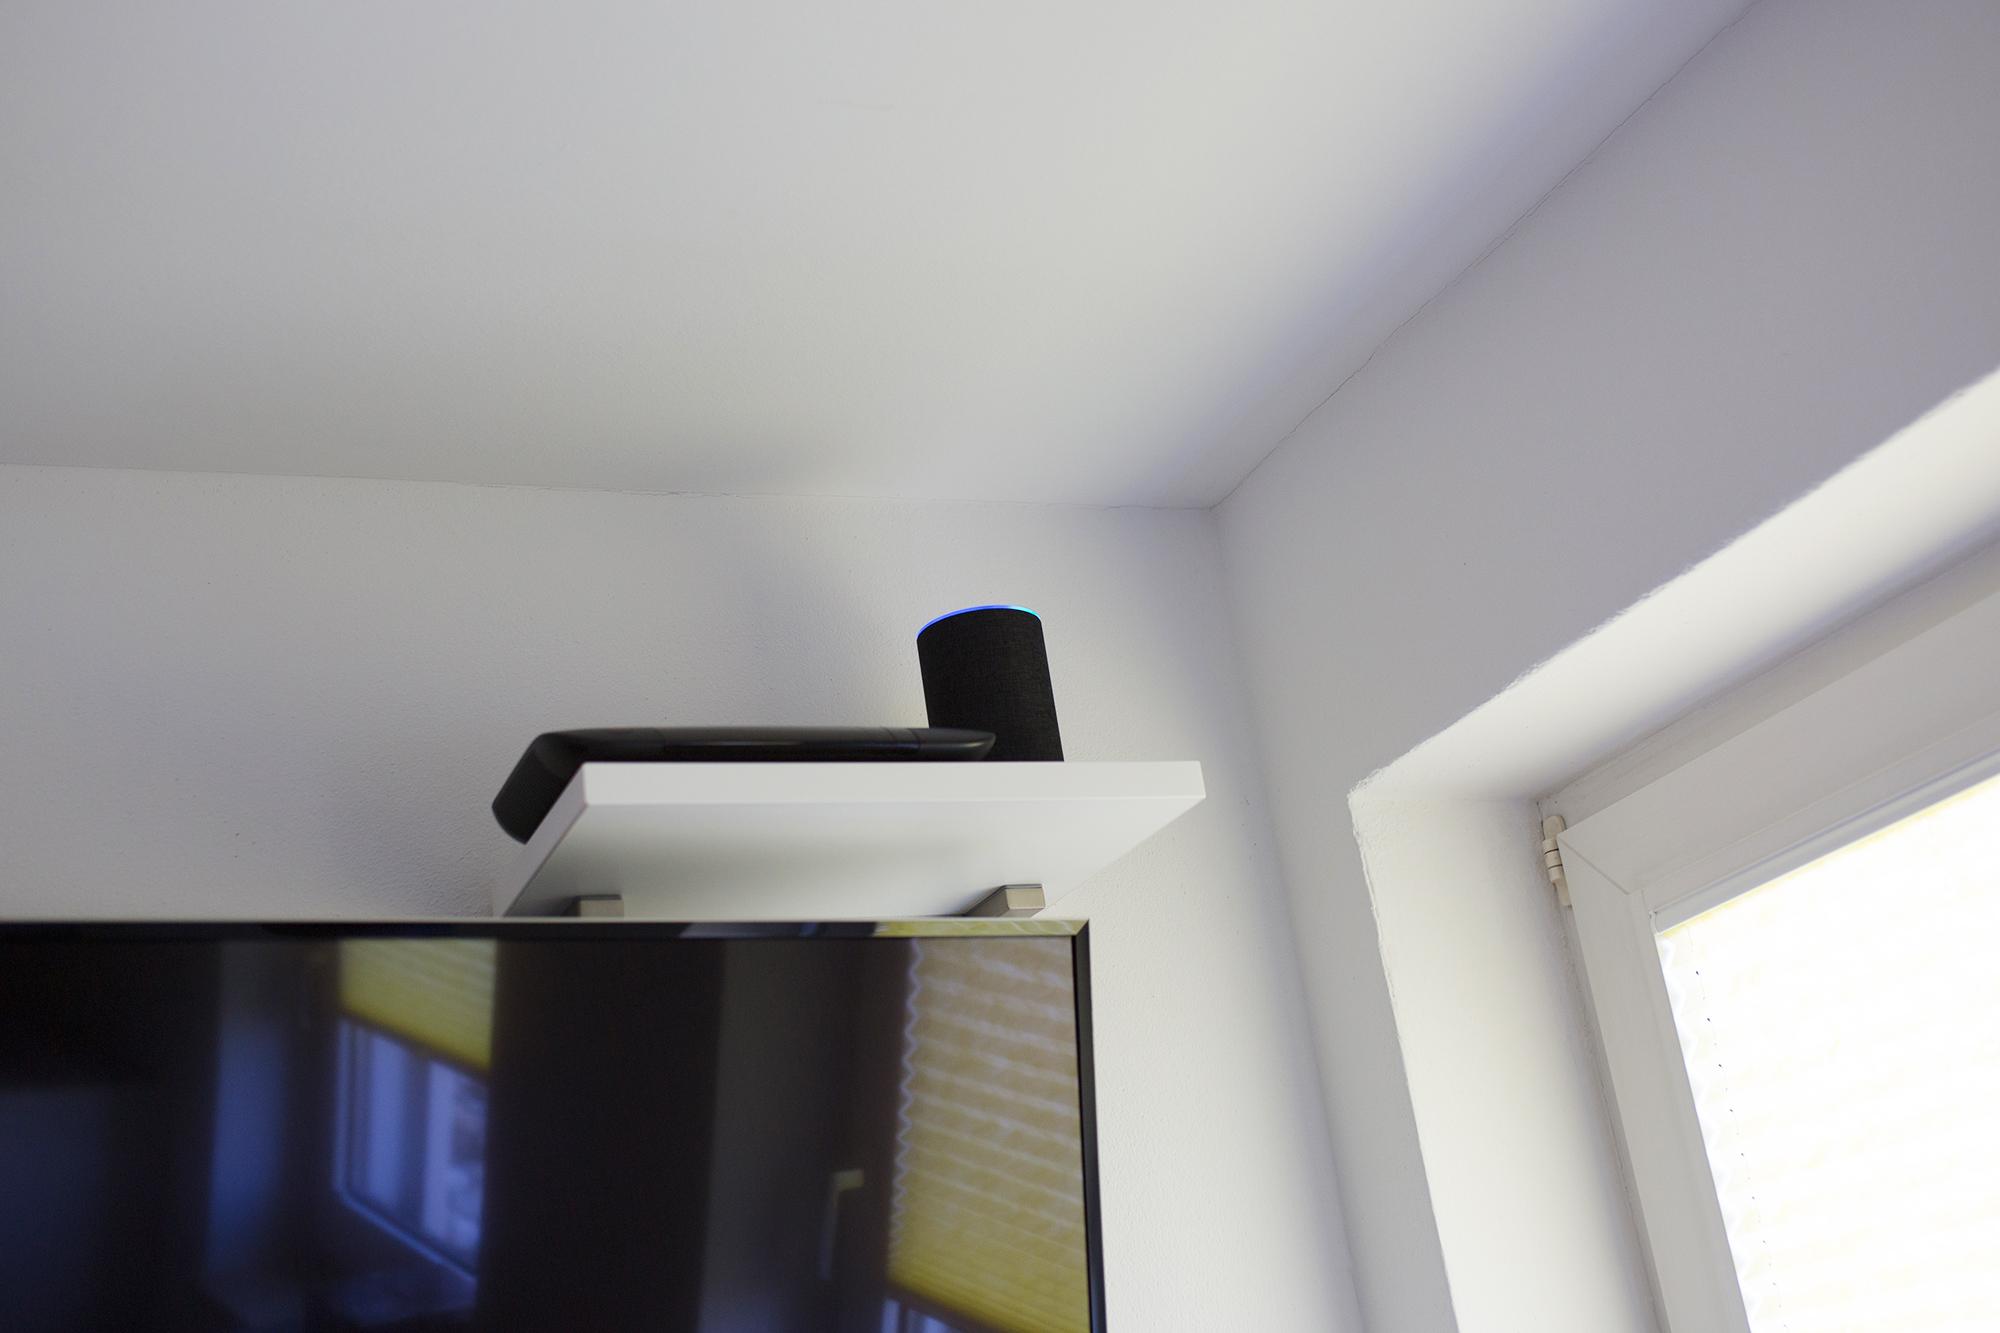 alexa im smart home. Black Bedroom Furniture Sets. Home Design Ideas